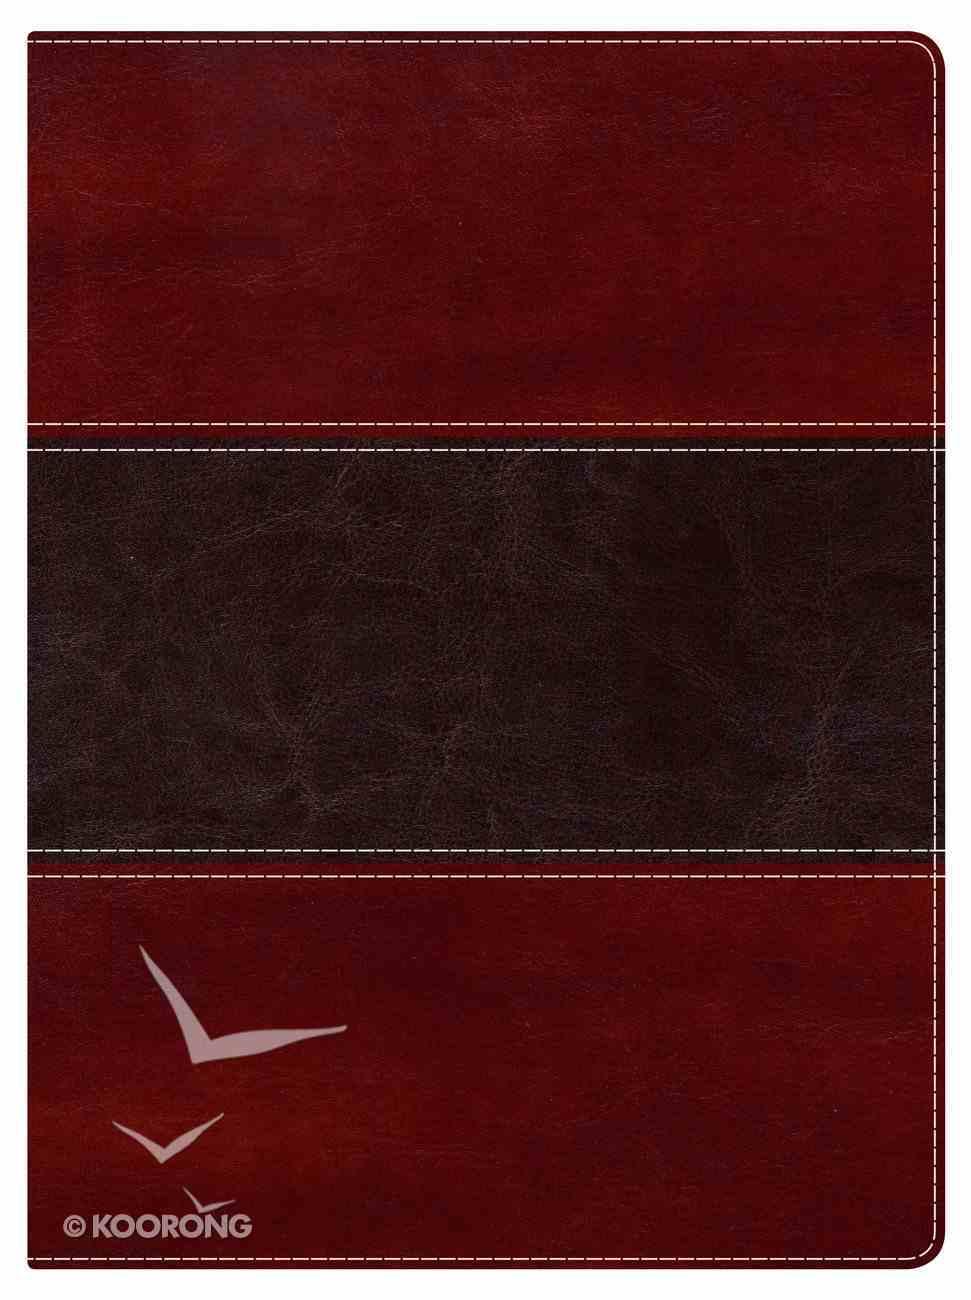 NKJV Holman Study Bible Mahogany Indexed Imitation Leather